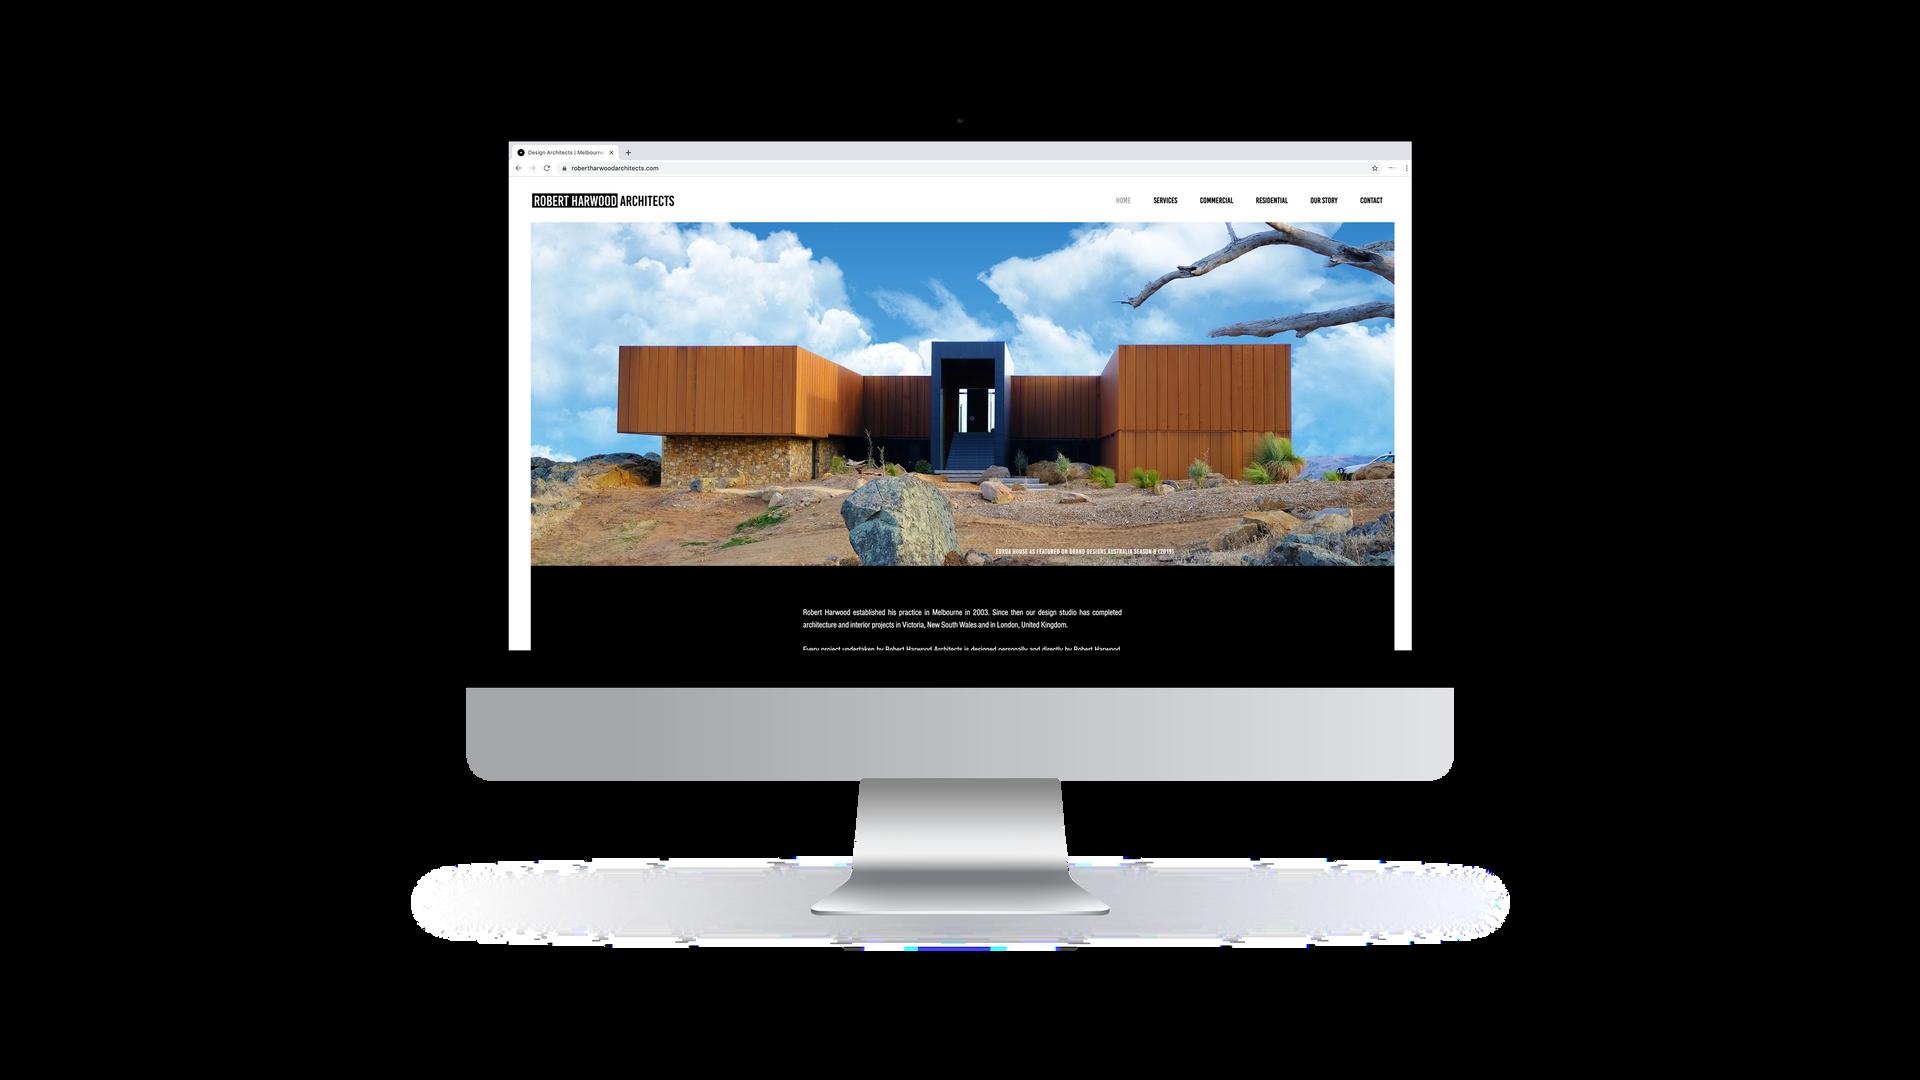 Robert Harwood Architects